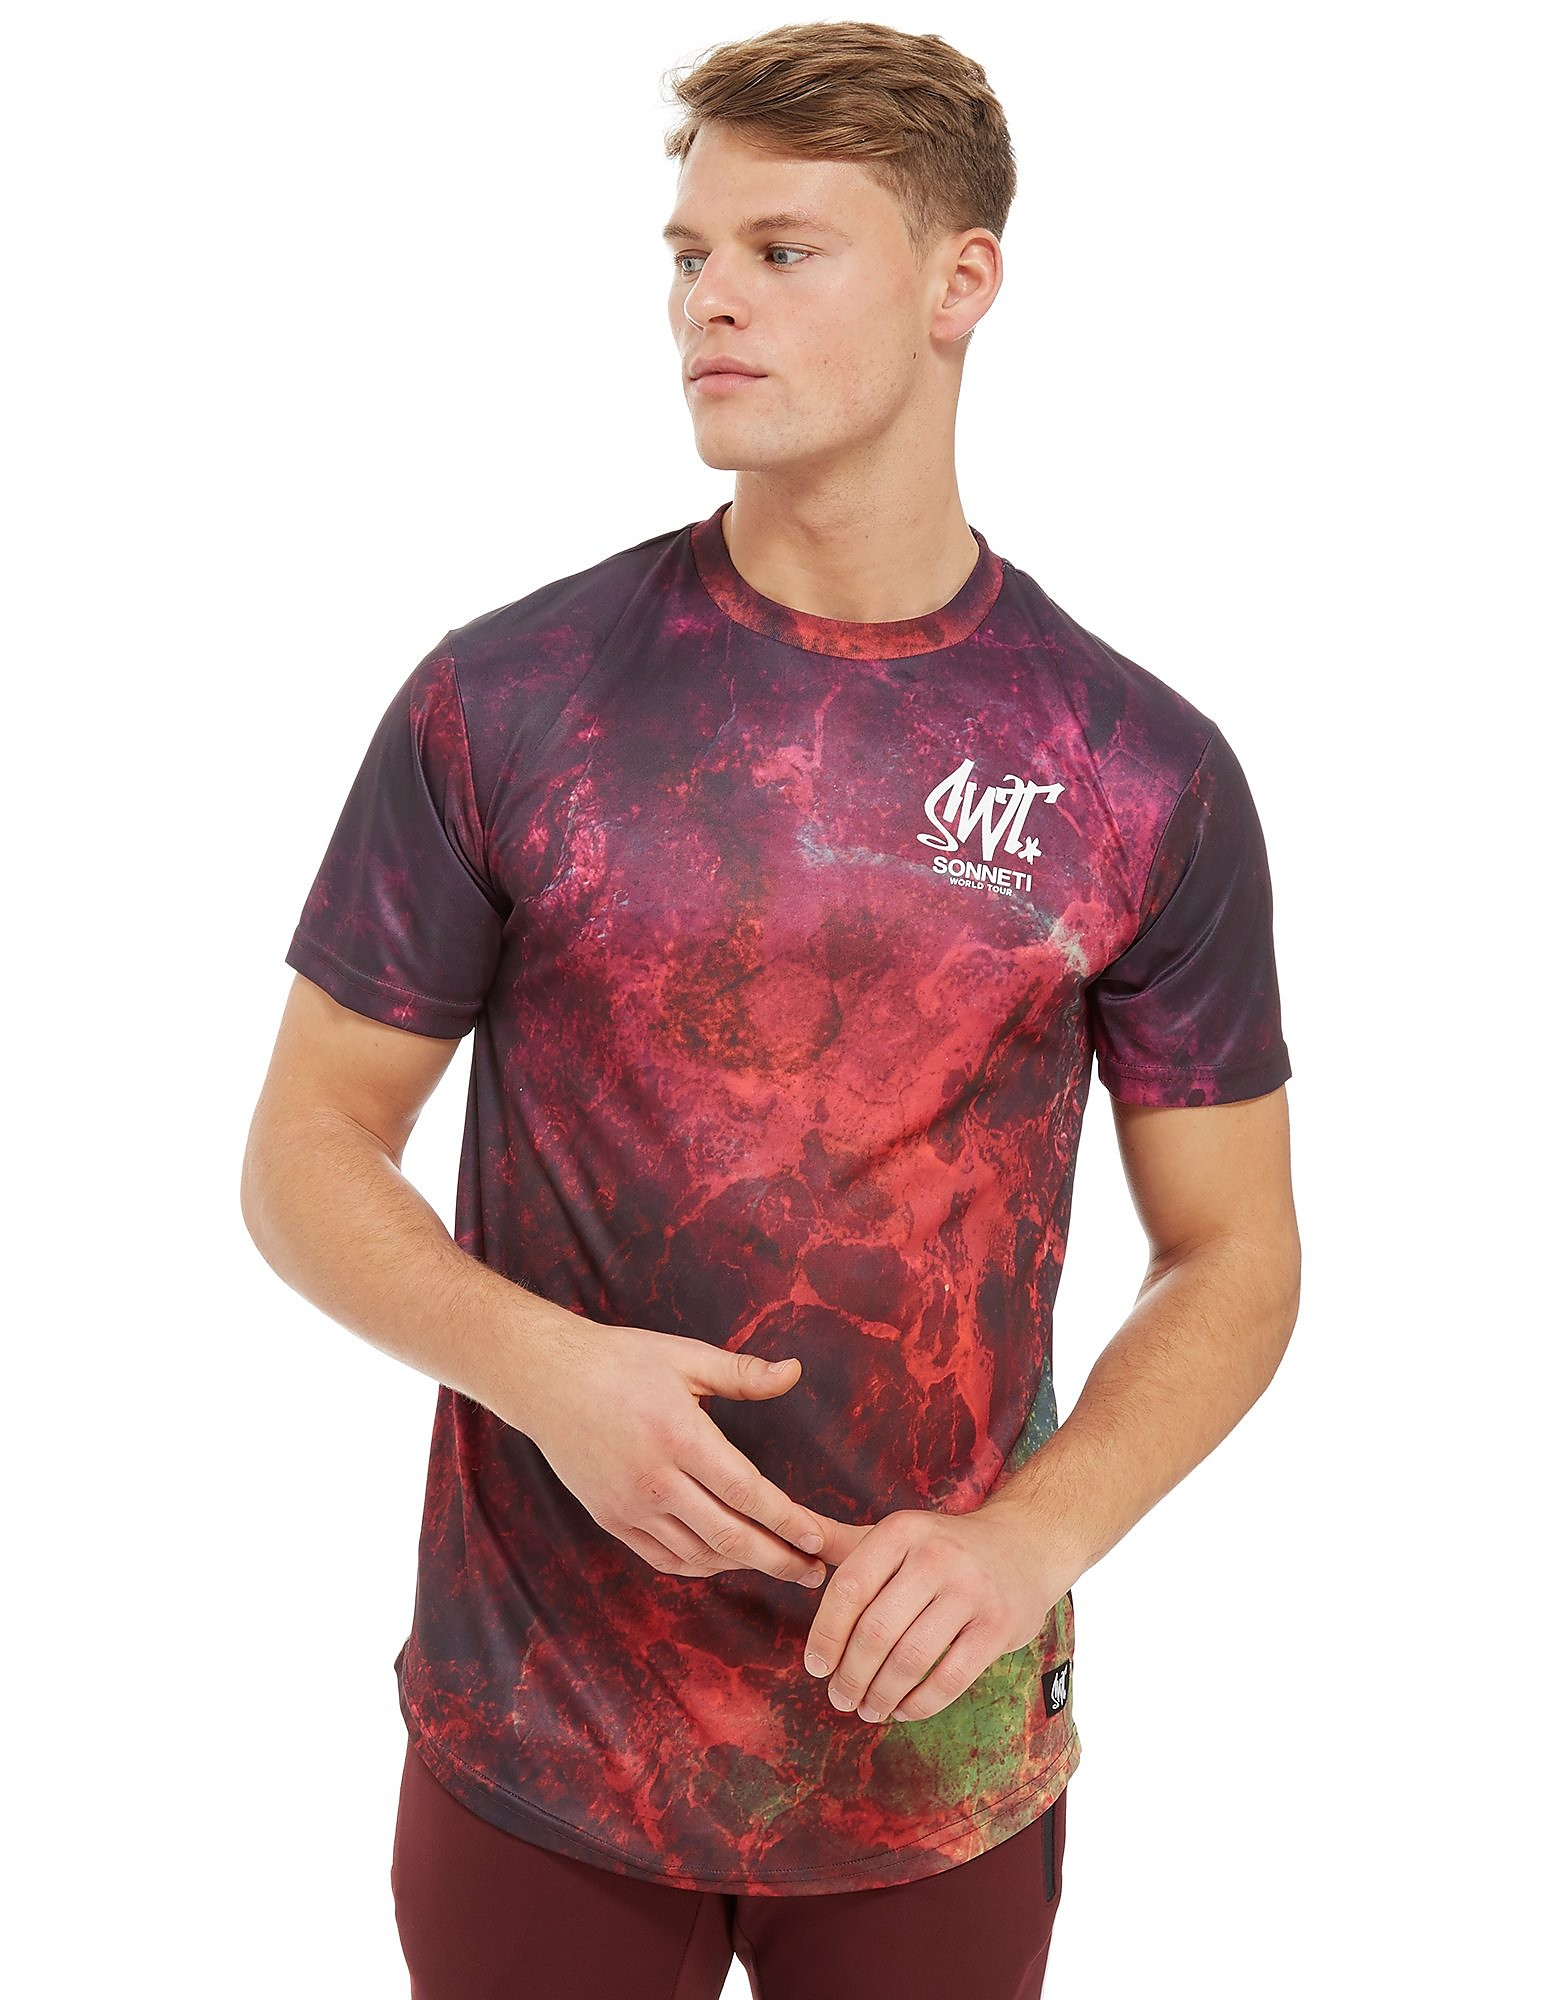 Sonneti Punch T-Shirt